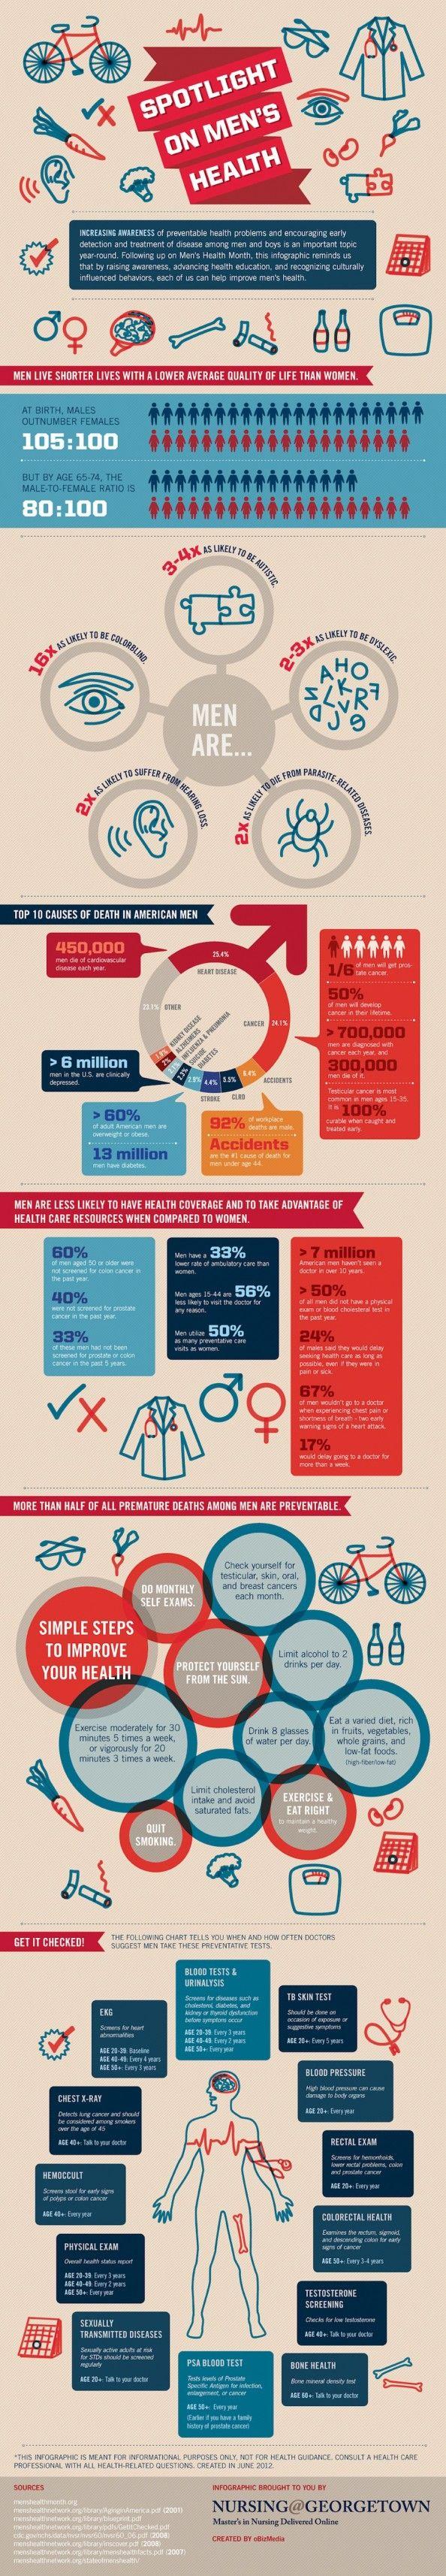 54 best nursing mens health images on pinterest nursing schools spotlight on mens health infographic fandeluxe Image collections